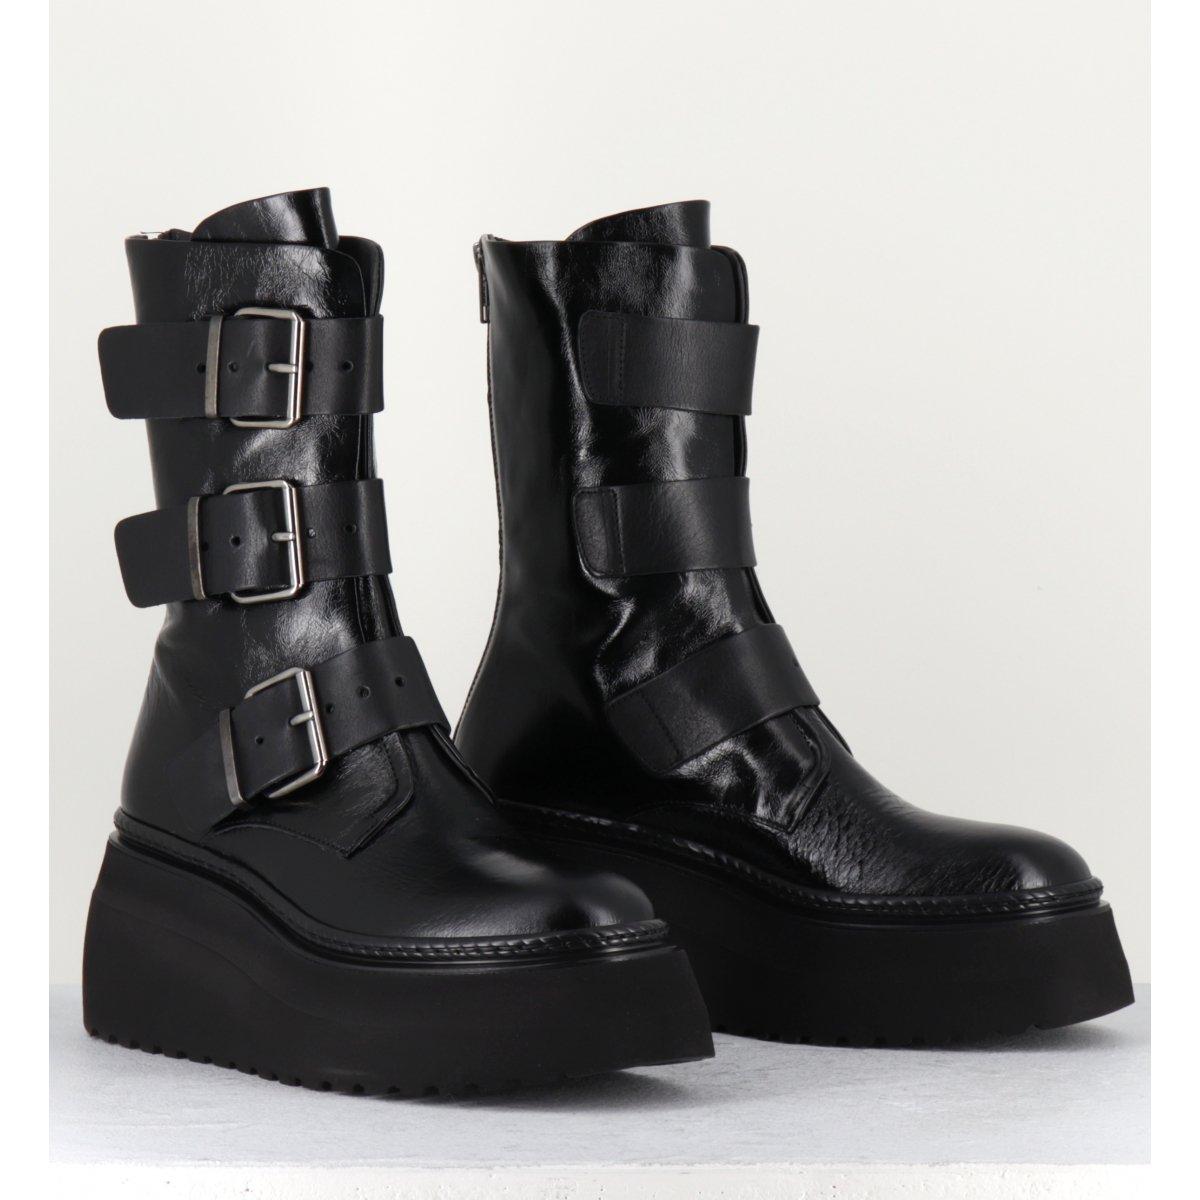 Boots plateforme micro cuir noir 3 boucles - 7280 SHINY NERO